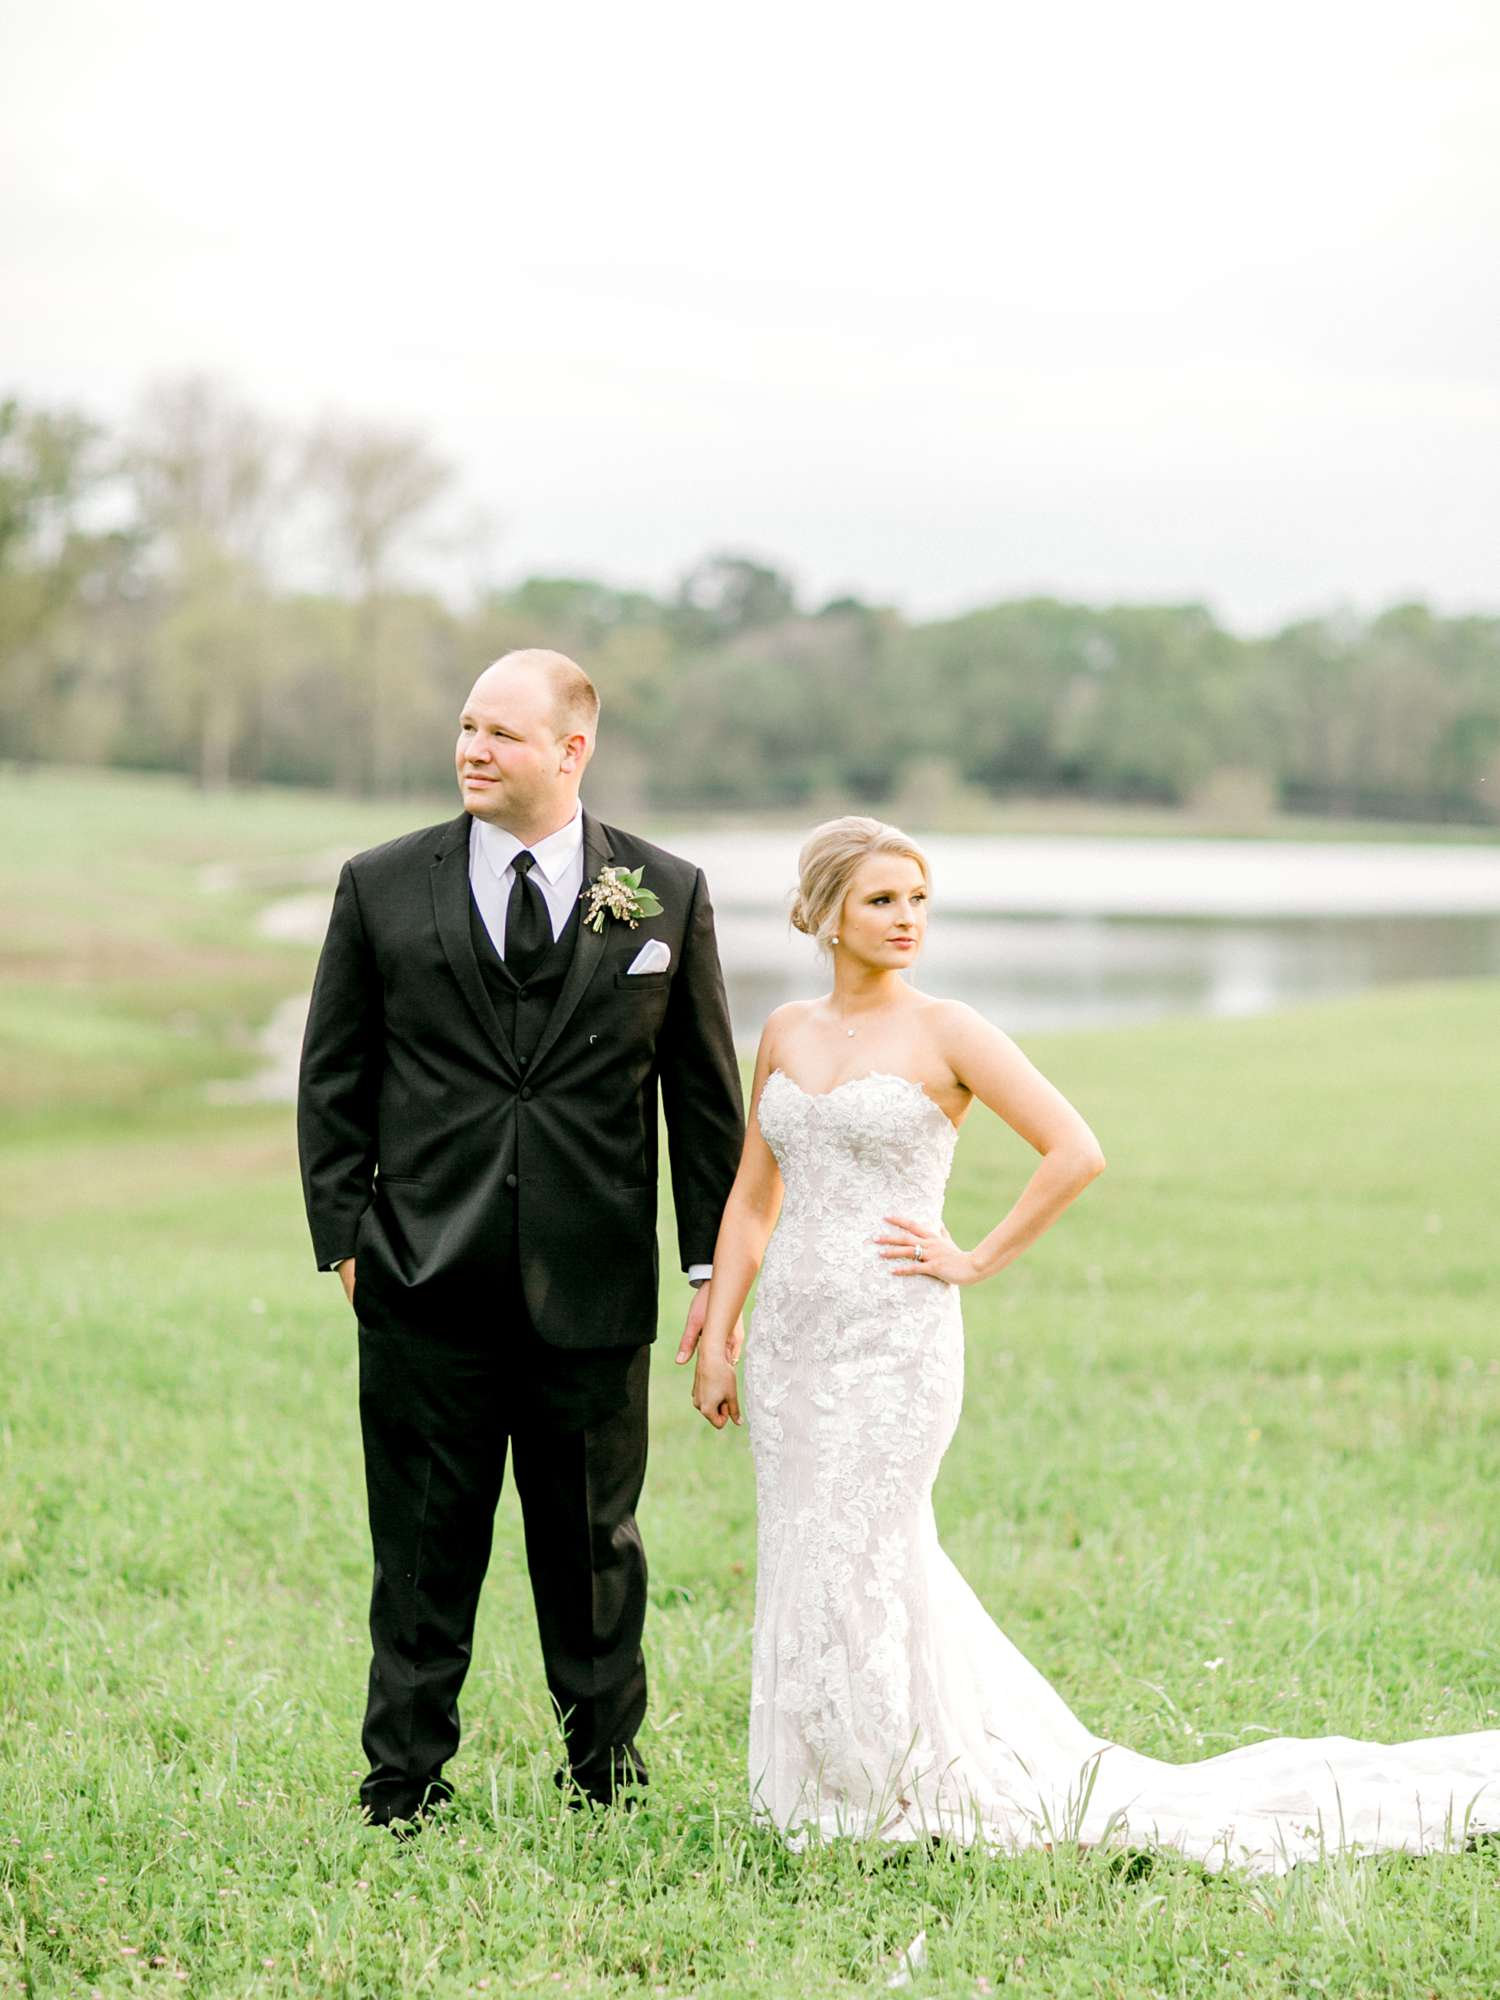 HEBERT_MORGAN_AND_CLAY_ALLEEJ_THE_FARMHOUSE_MONTGOMERY_TEXAS_WEDDING_0143.jpg